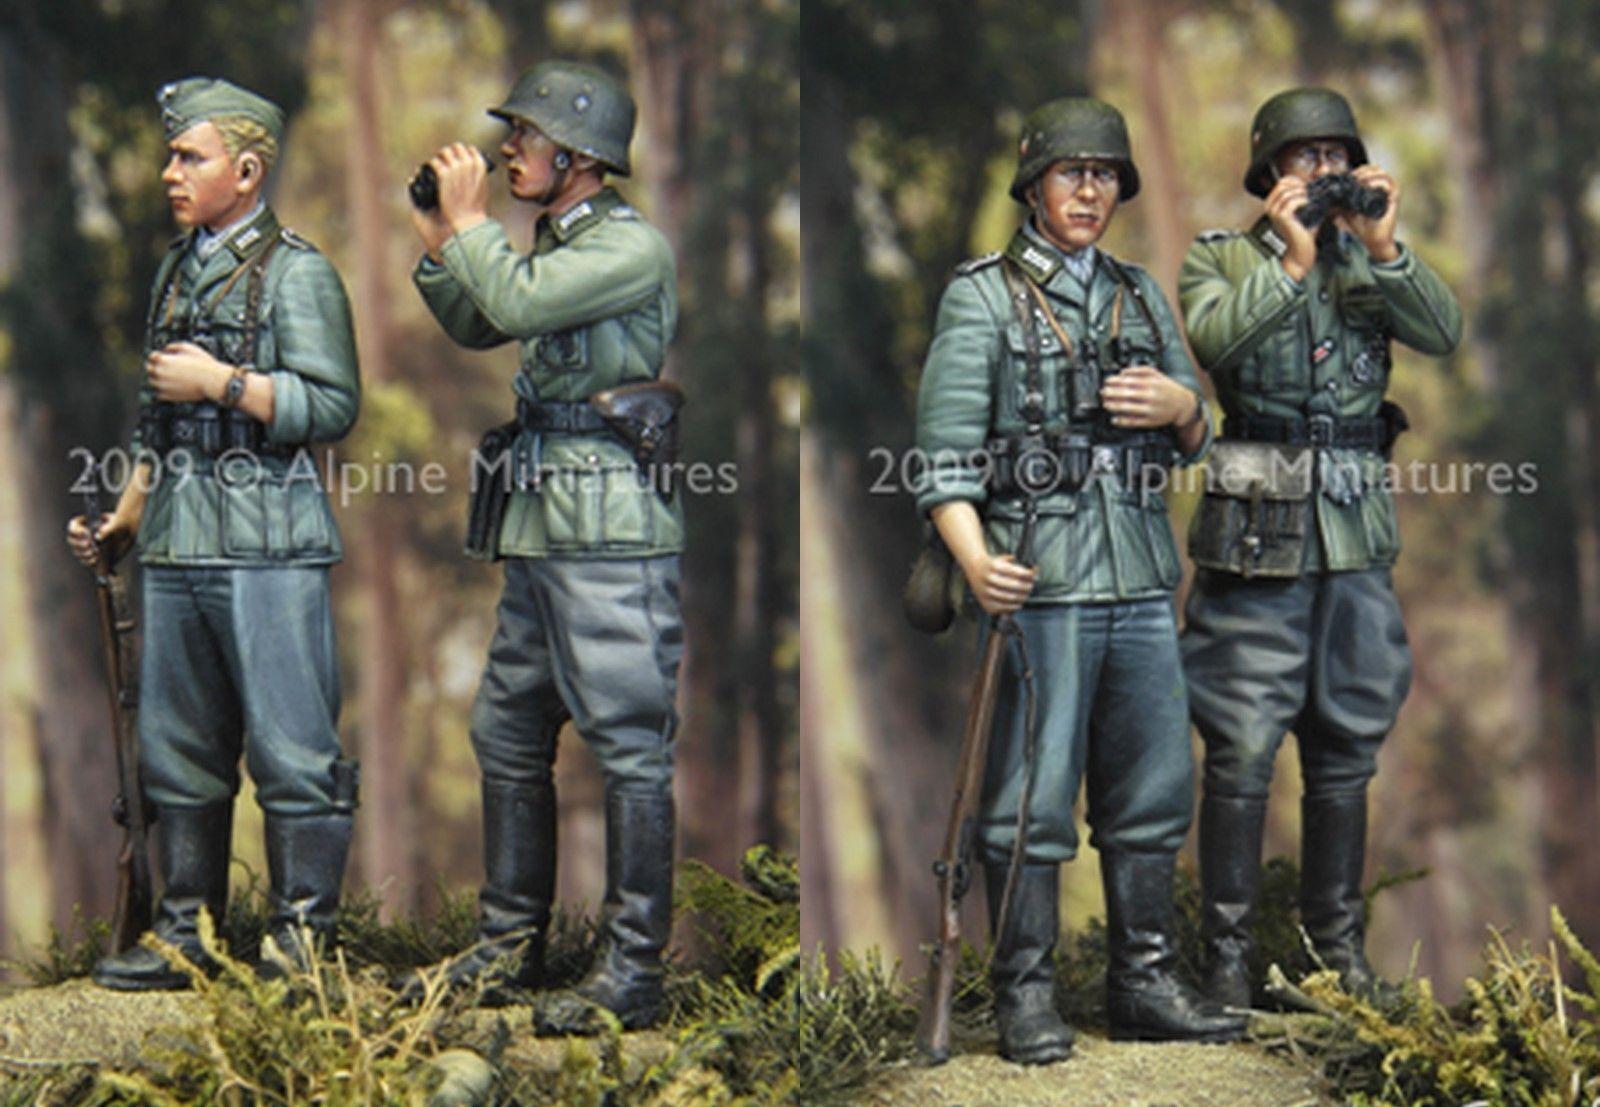 ALPINE MINIATURES, 35083, WW2 German Infantry 2 figures set, SCALE 1 35